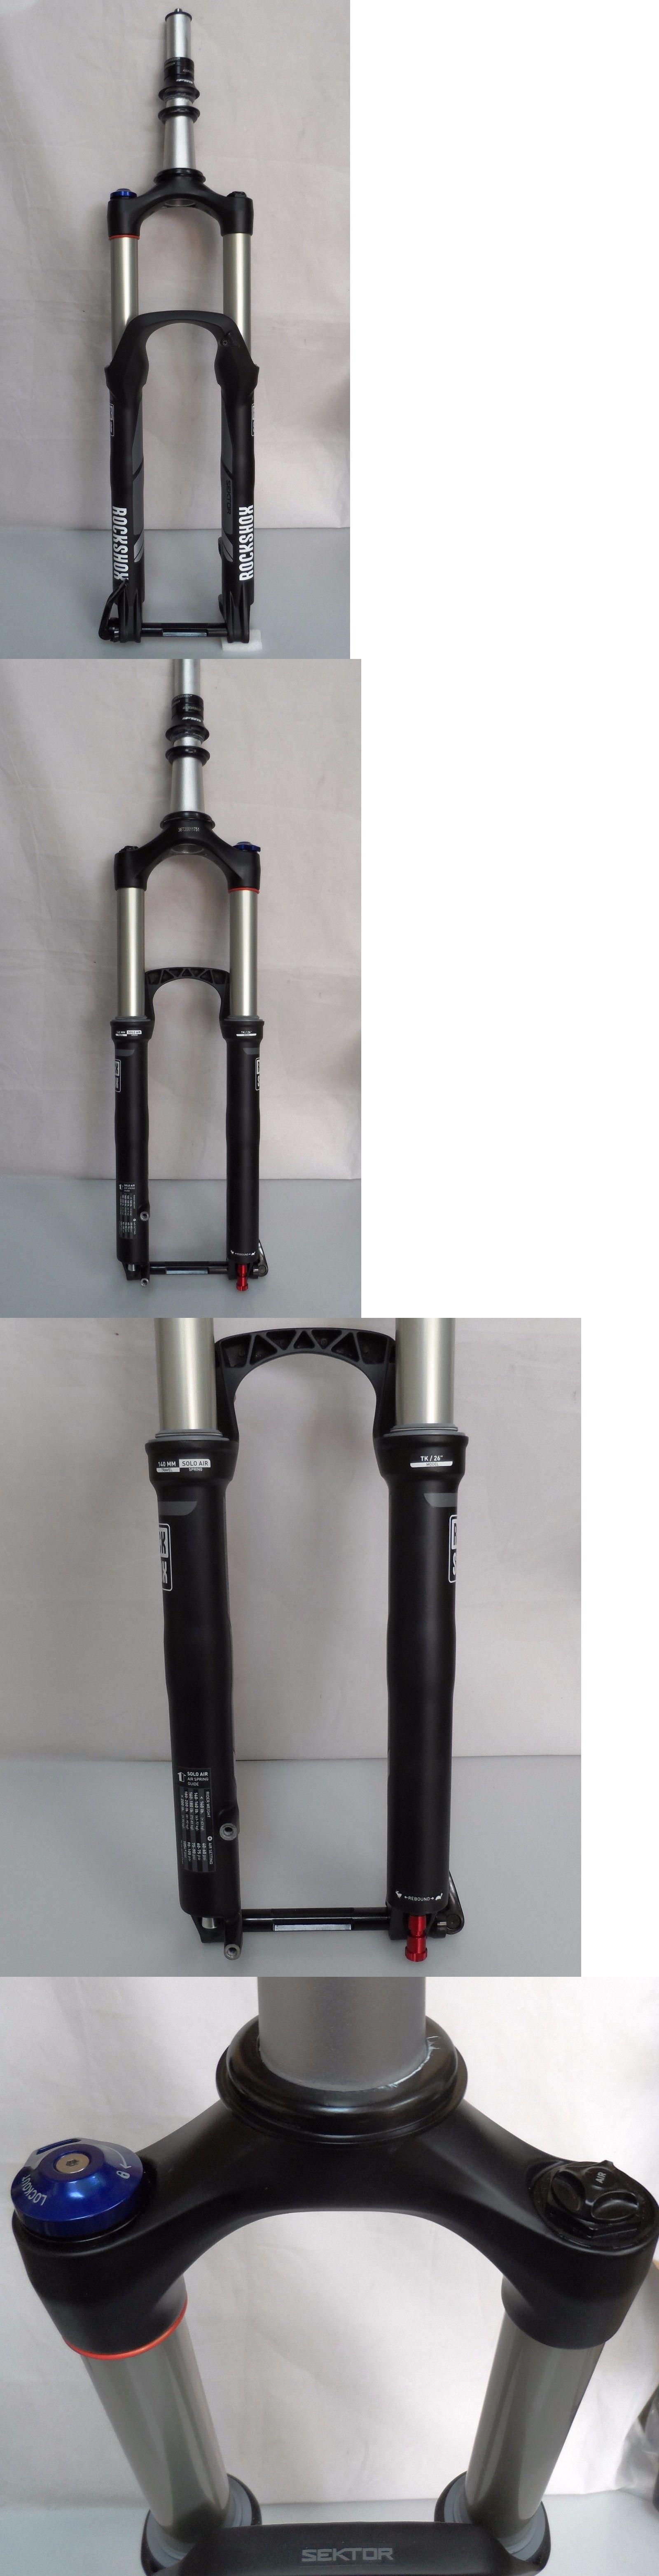 Forks 177815: Rockshox Sektor Tk 26 Mtb Suspension Fork 140Mm, Solo Air, Tapered, Black, New -> BUY IT NOW ONLY: $199.99 on eBay!